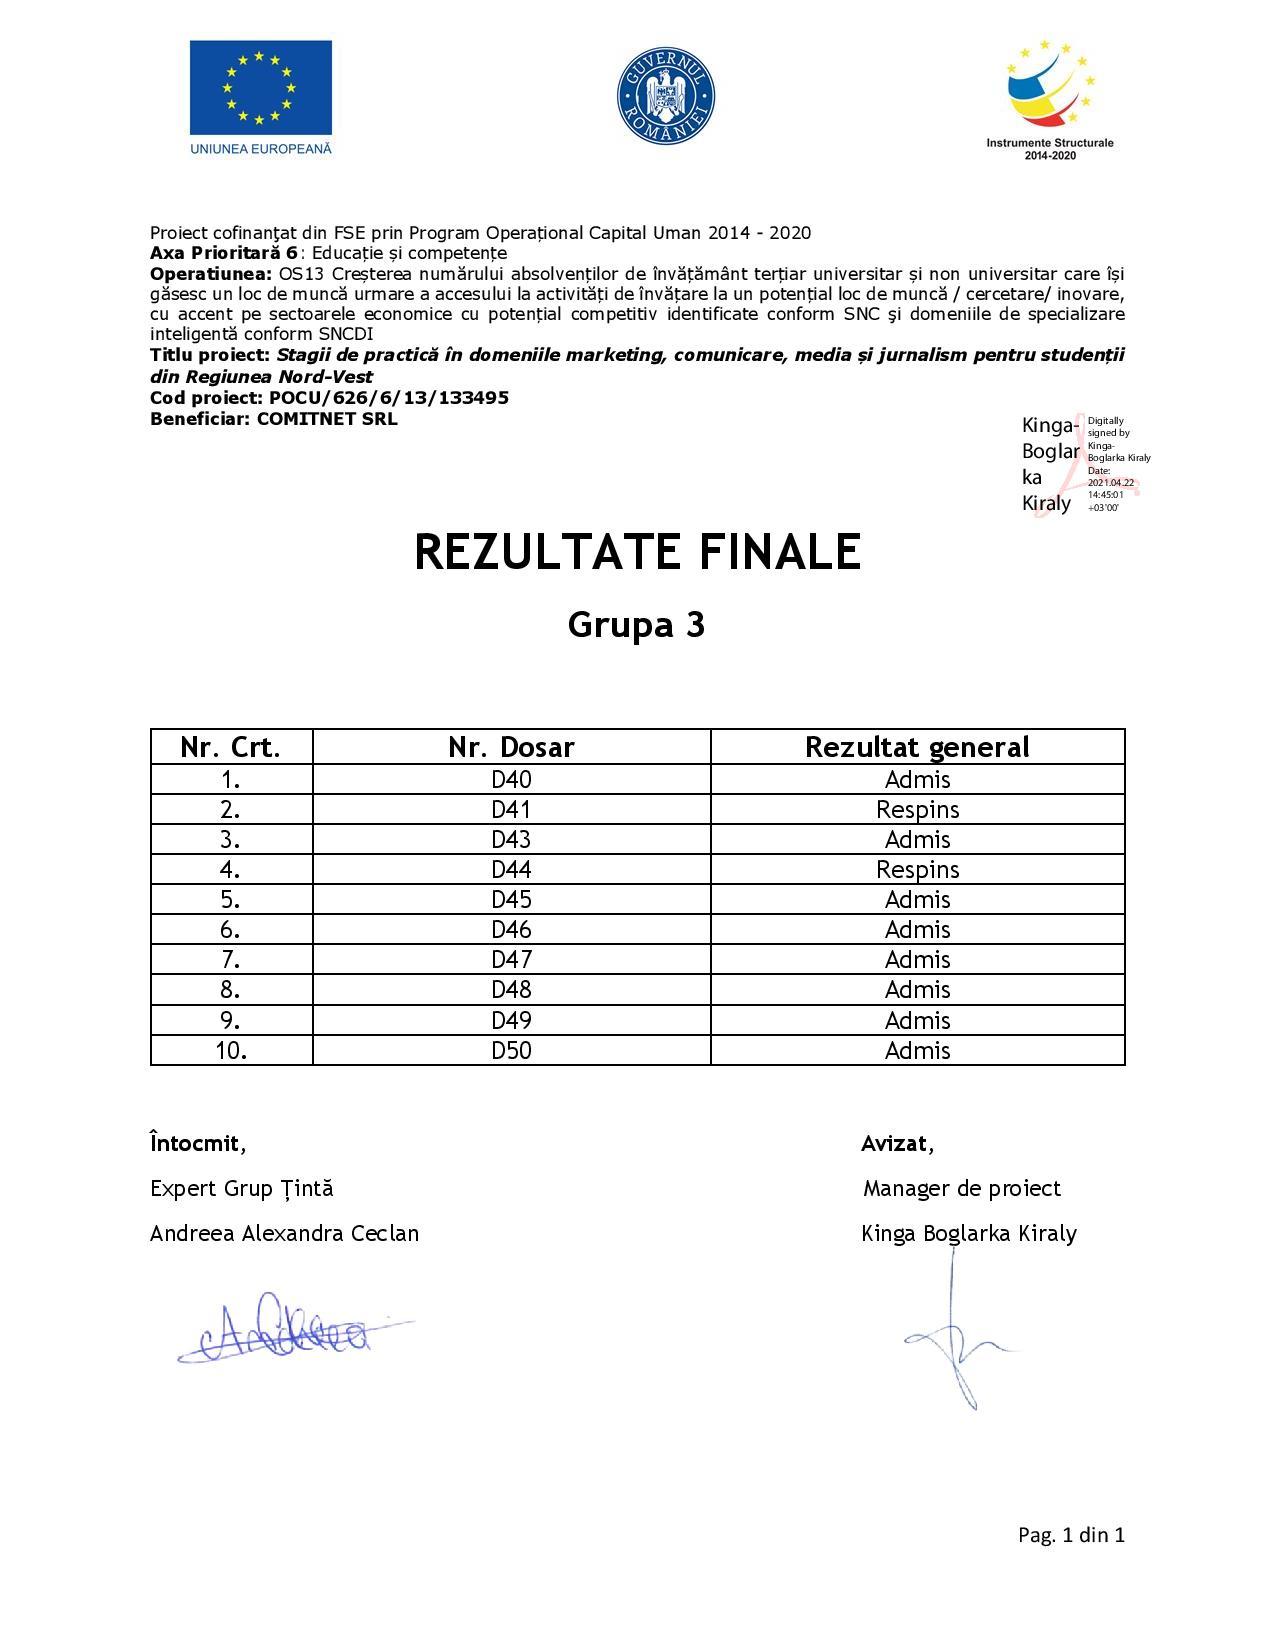 [Stagii de Practică SEO 365] Rezultate finale - Grupa III (2)-page-001